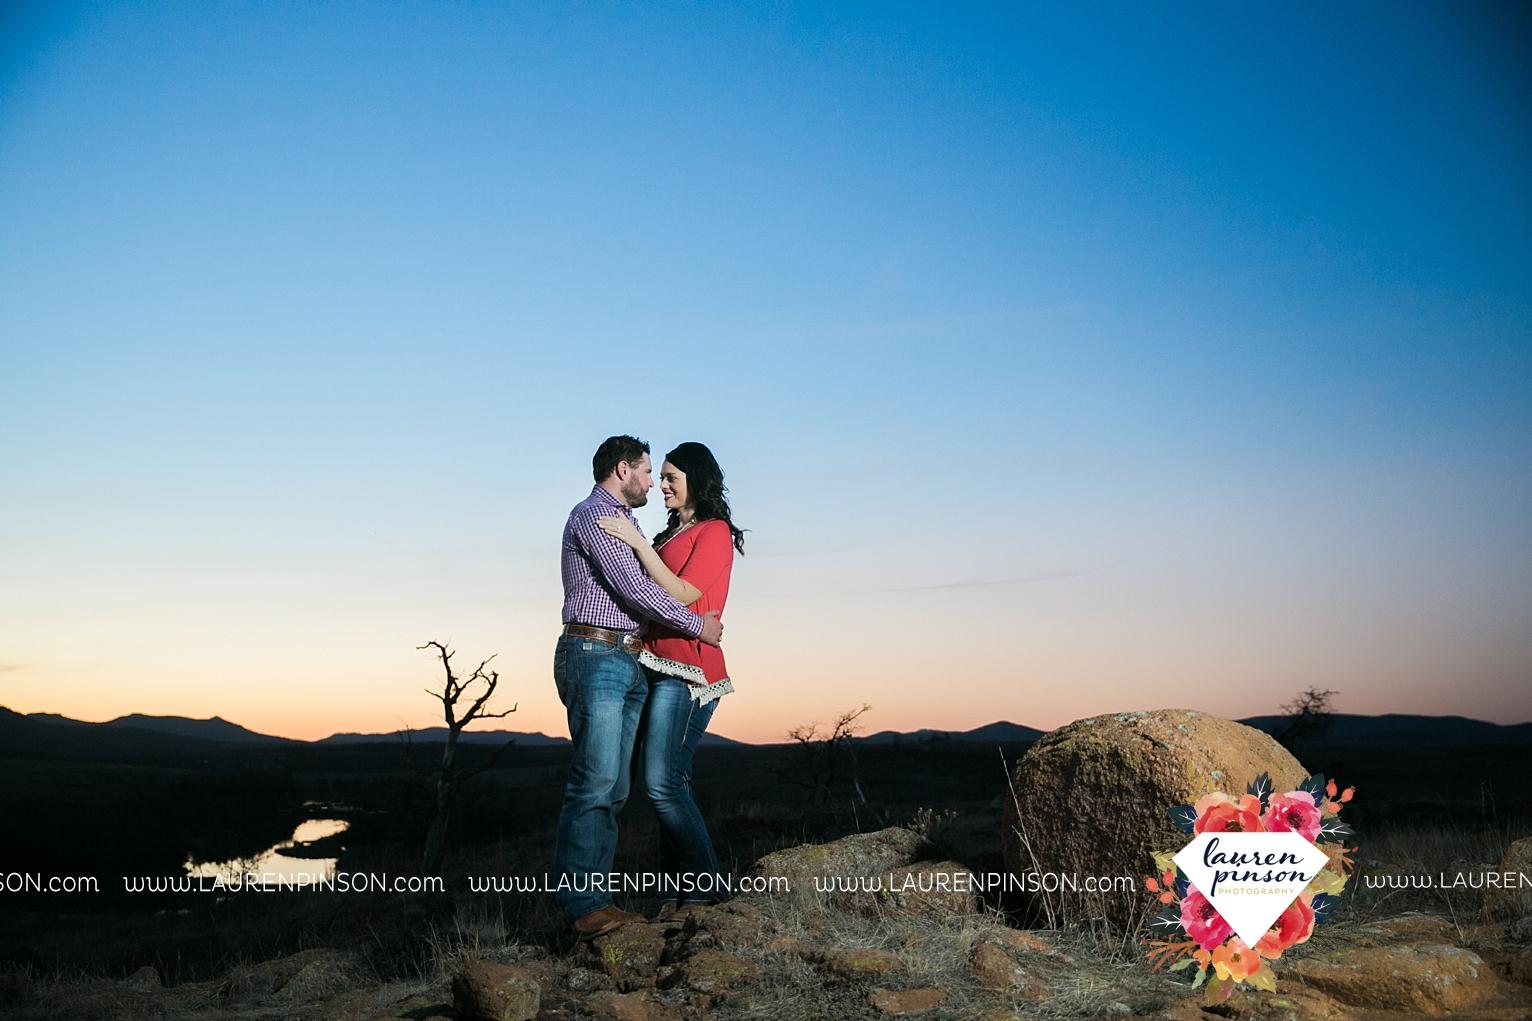 wichita-falls-texas-engagement-photographer-wedding-oklahoma-lawton-wichita-mountains-refuge-outdoors-mountains-engaged_2071.jpg